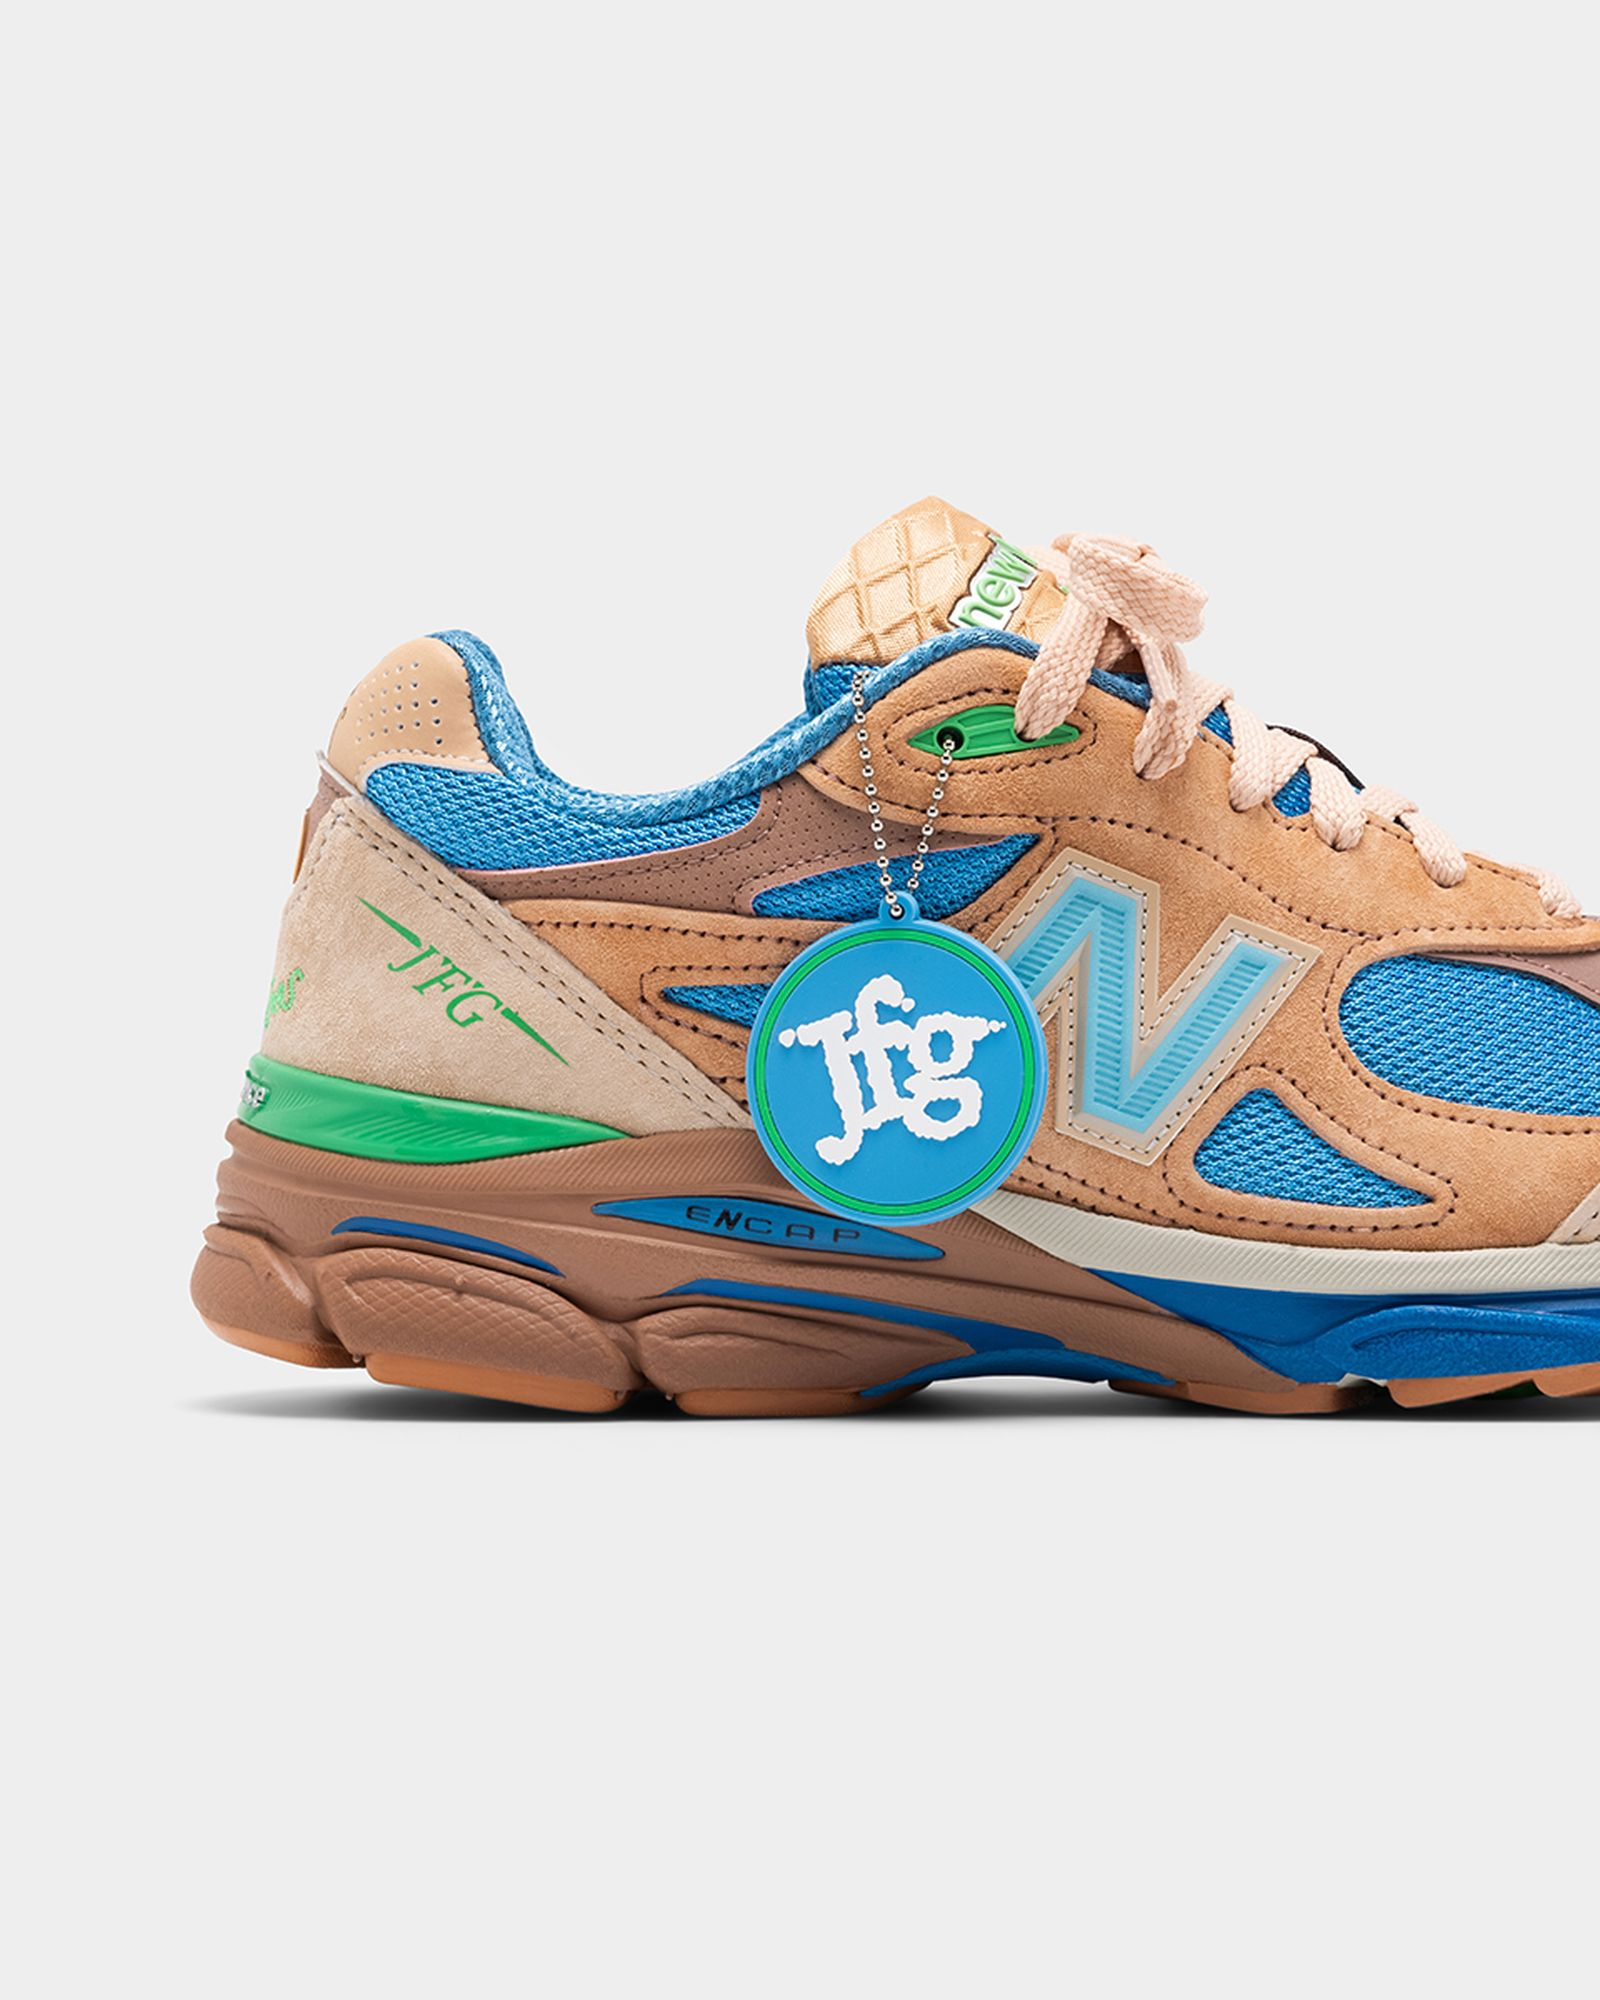 joe-freshgoods-new-balance-990v3-release-date-price-01